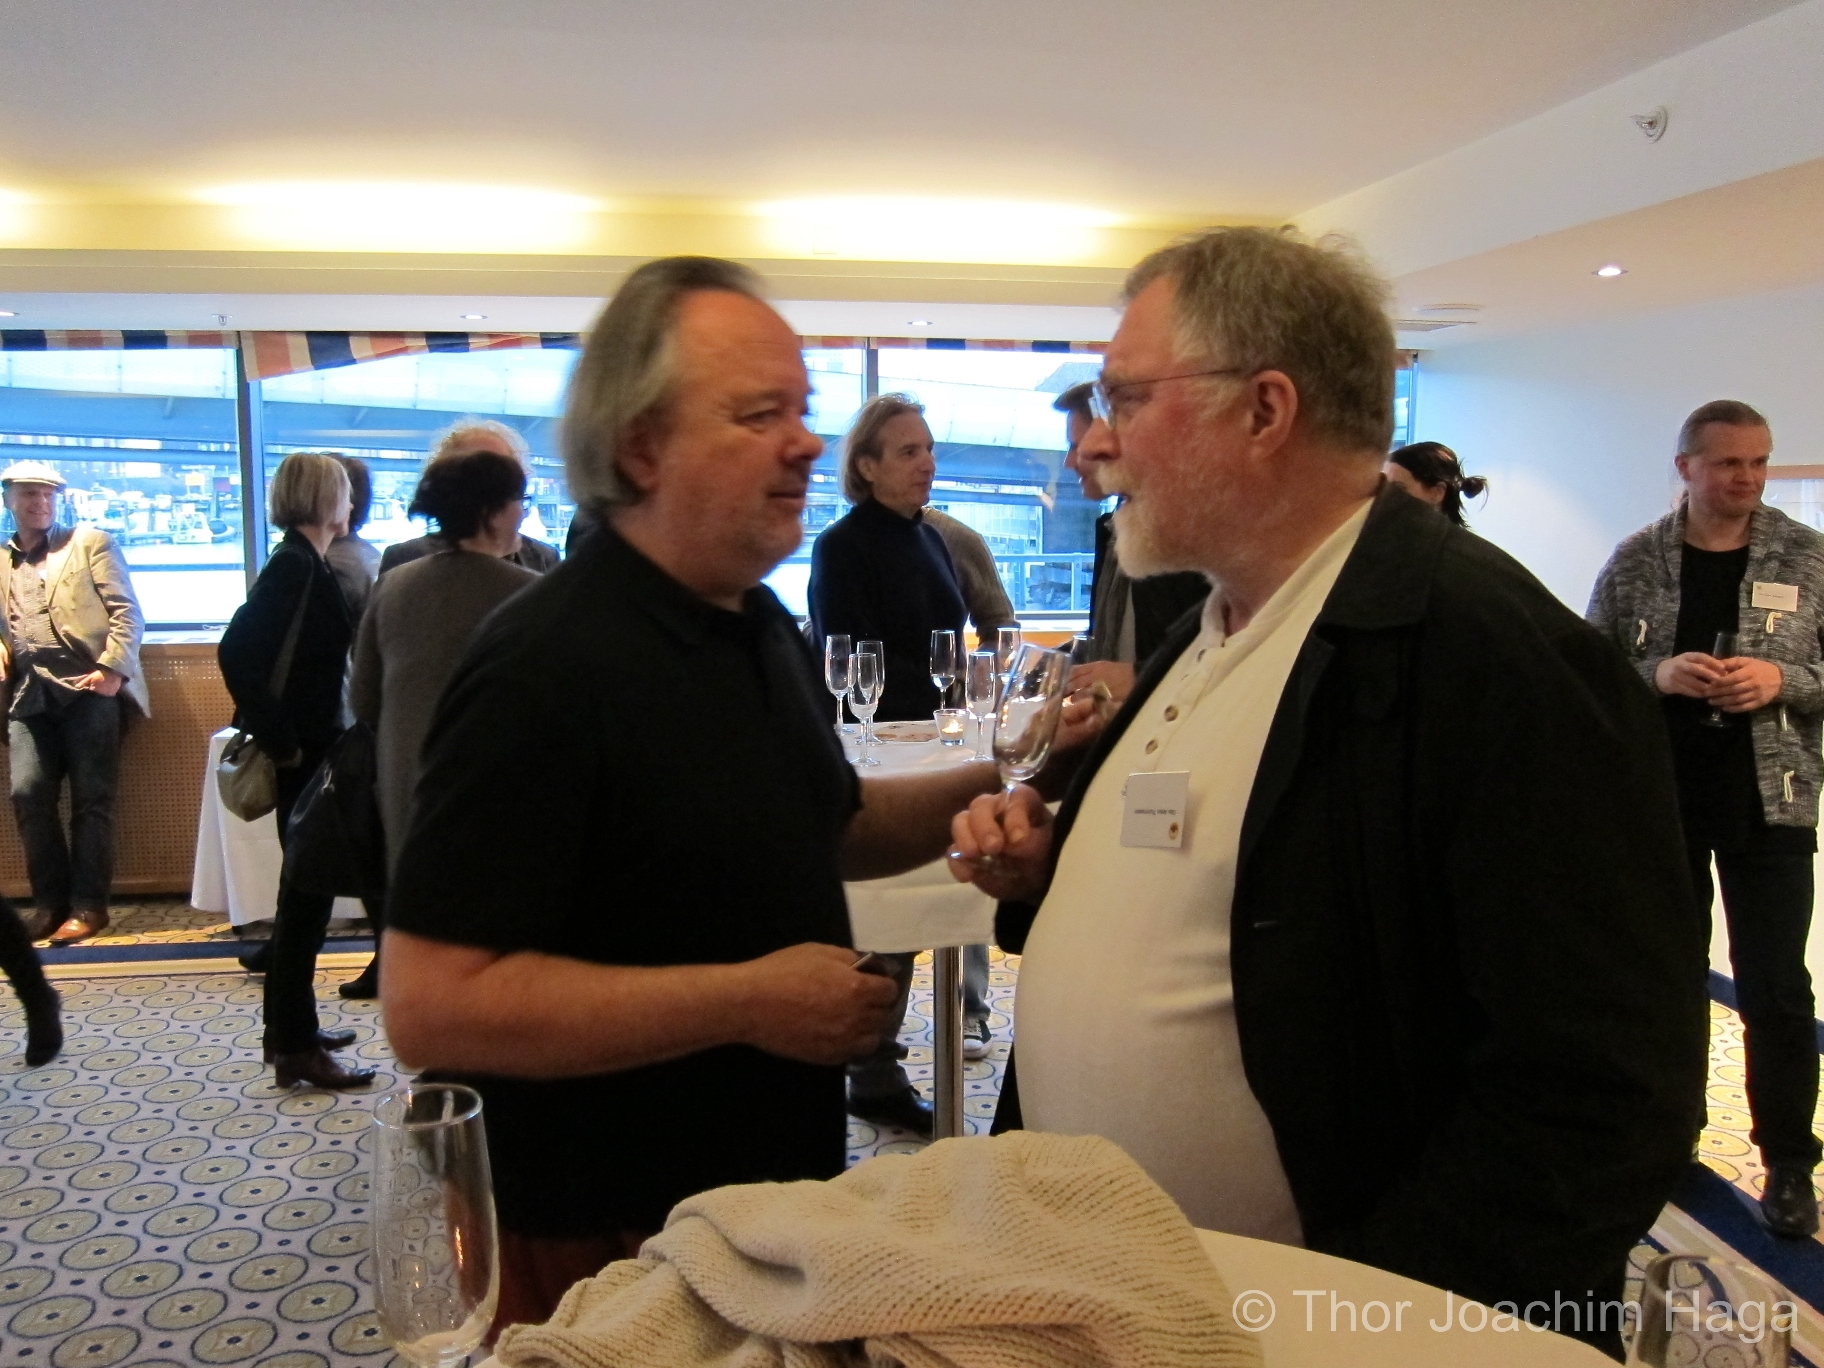 Geir Bøhren og Olav Anton Thommessen